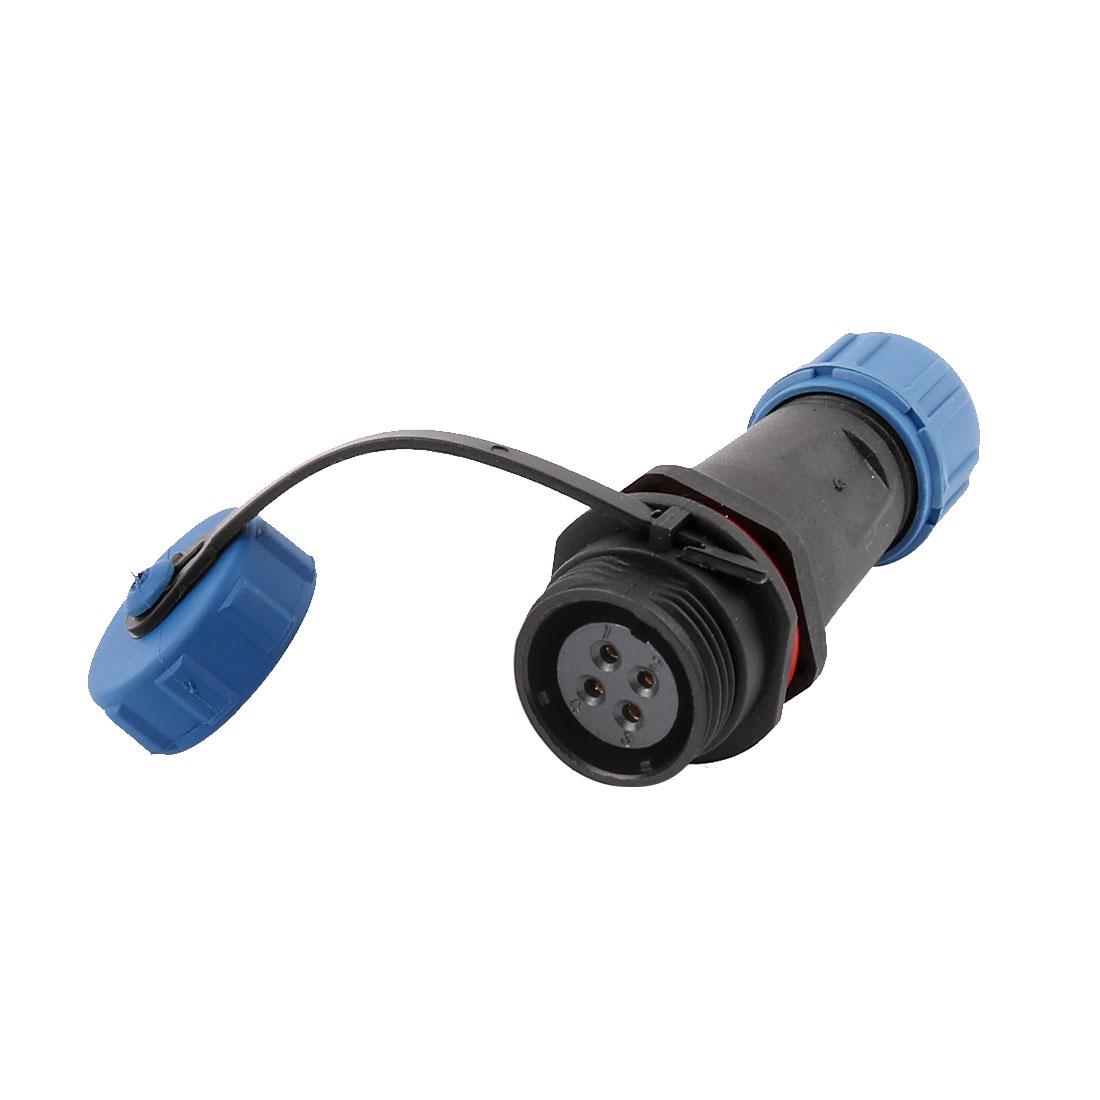 AC 500V 4 Terminals SP1311/S Waterproof Aviation Socket Dustproof Adapter Connector